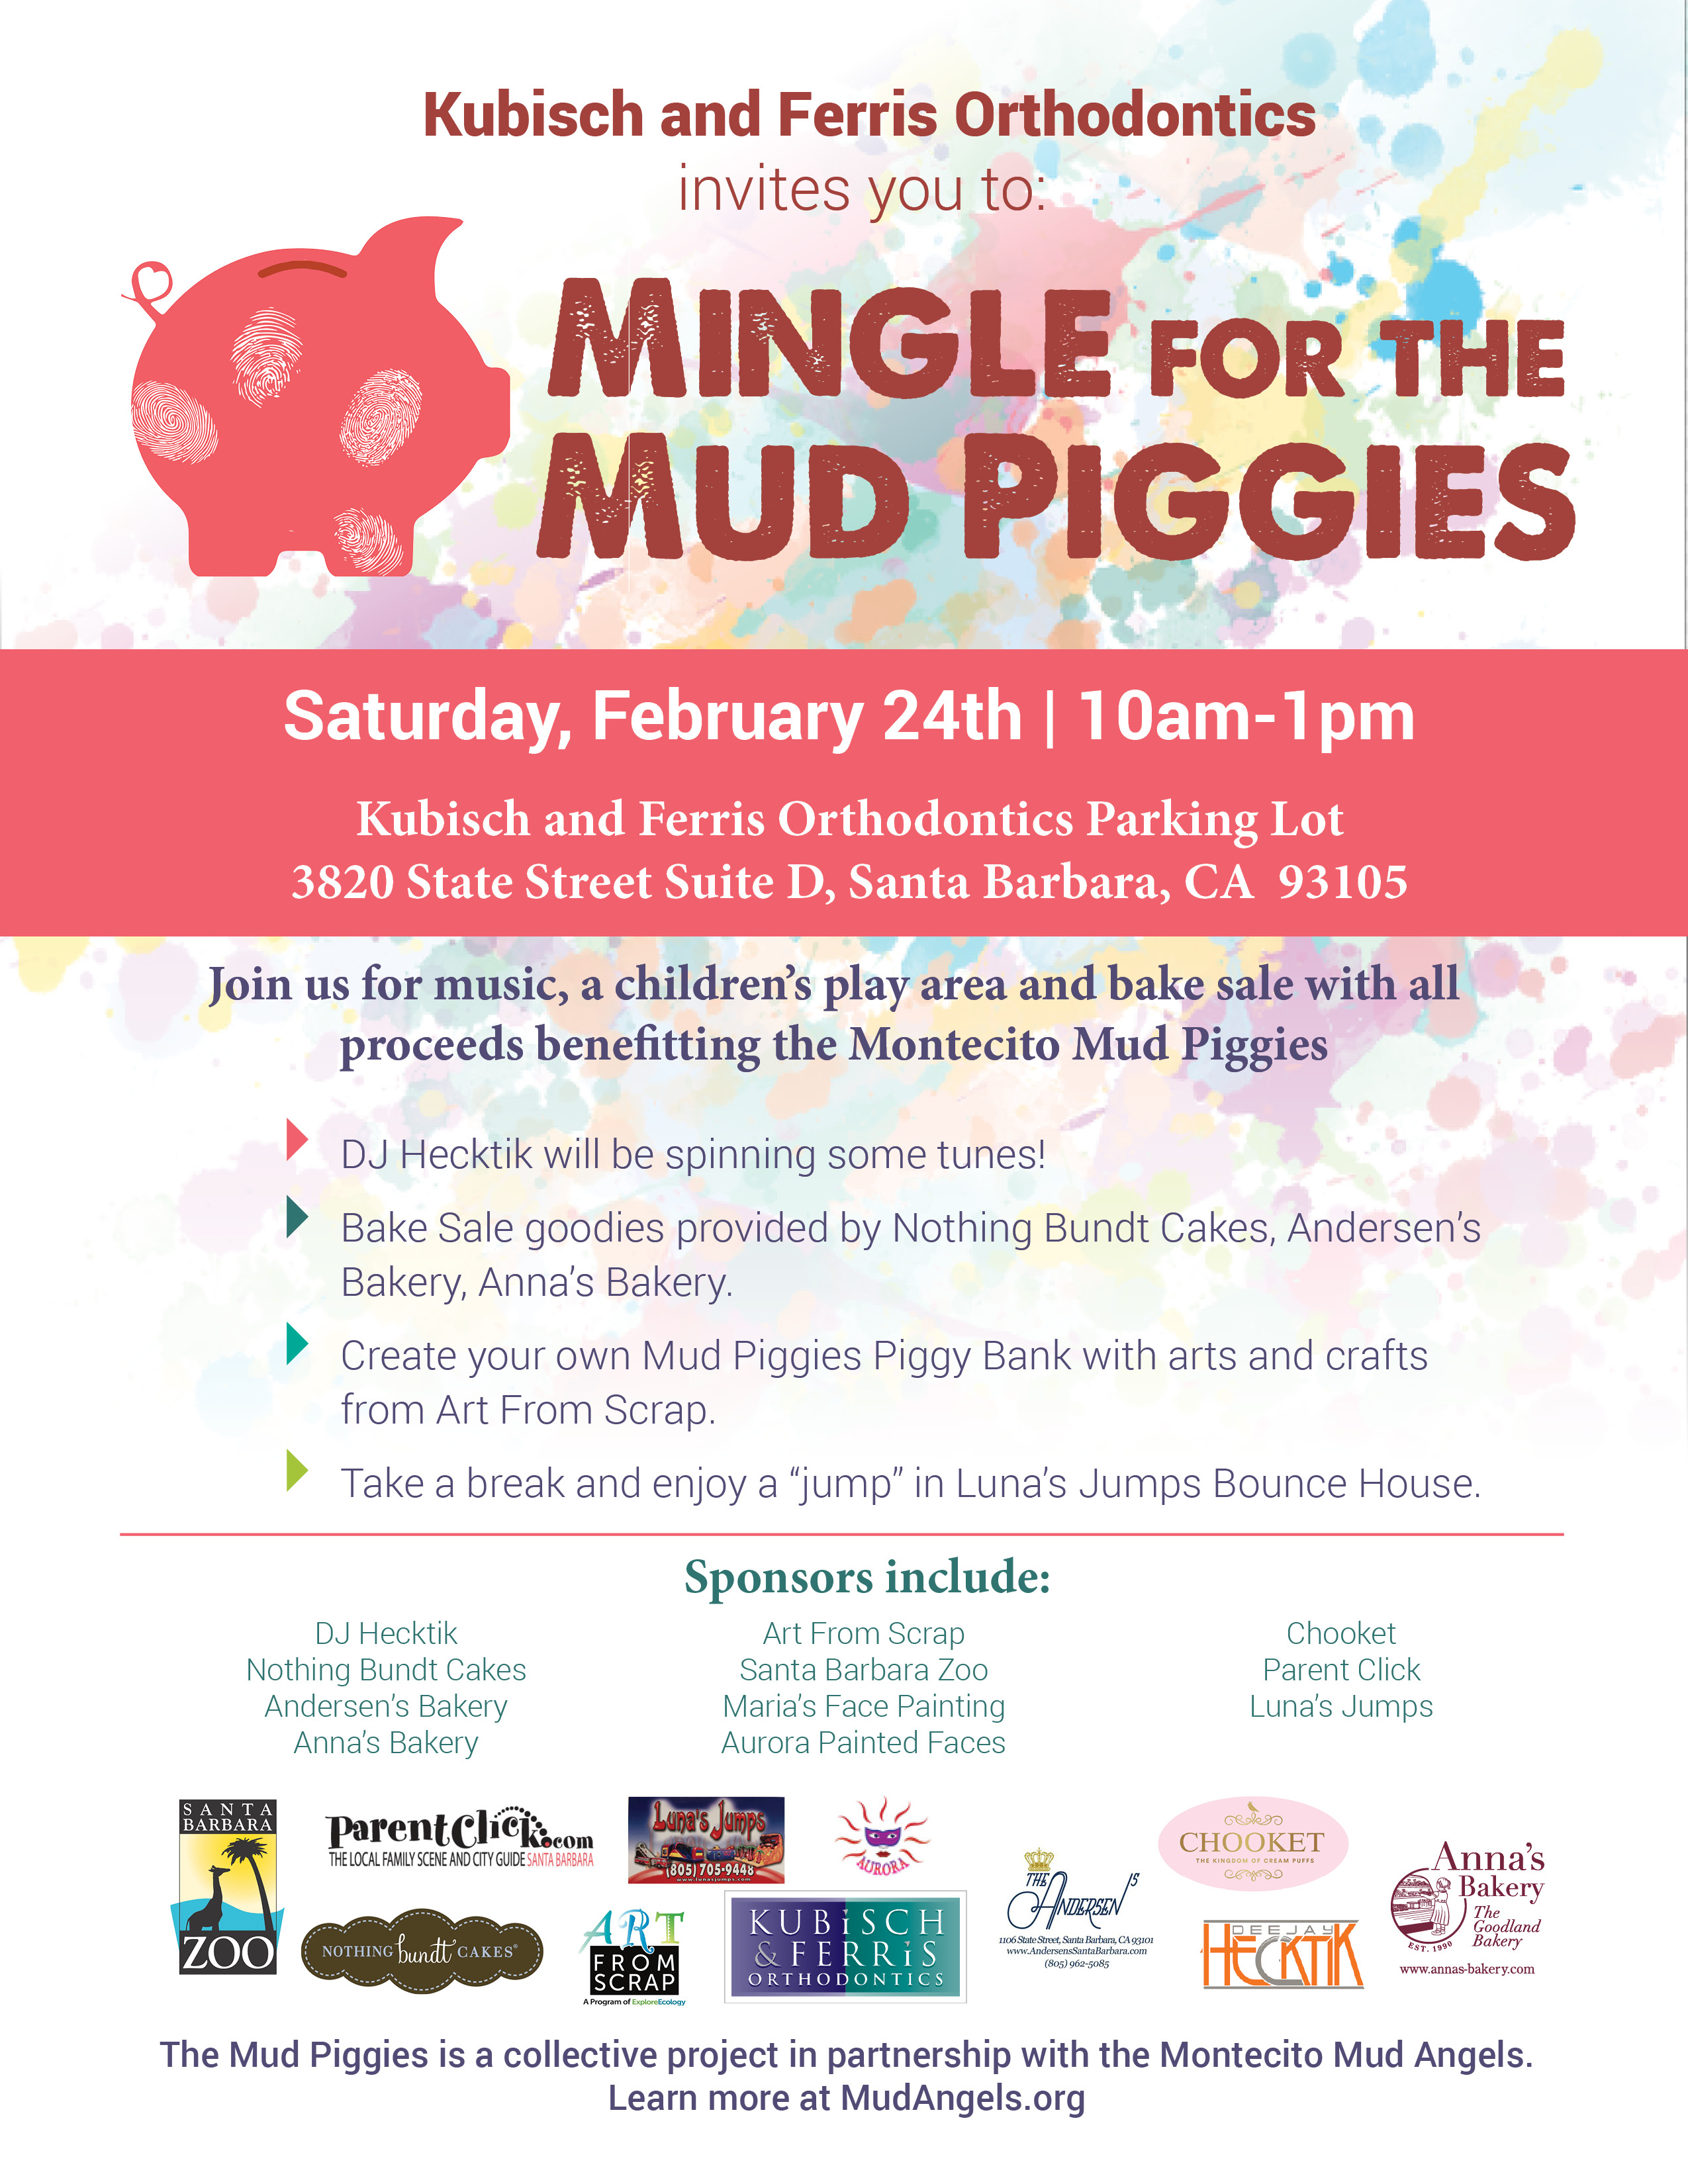 Mingle For The Mud Piggies Kids Fundraising Festival